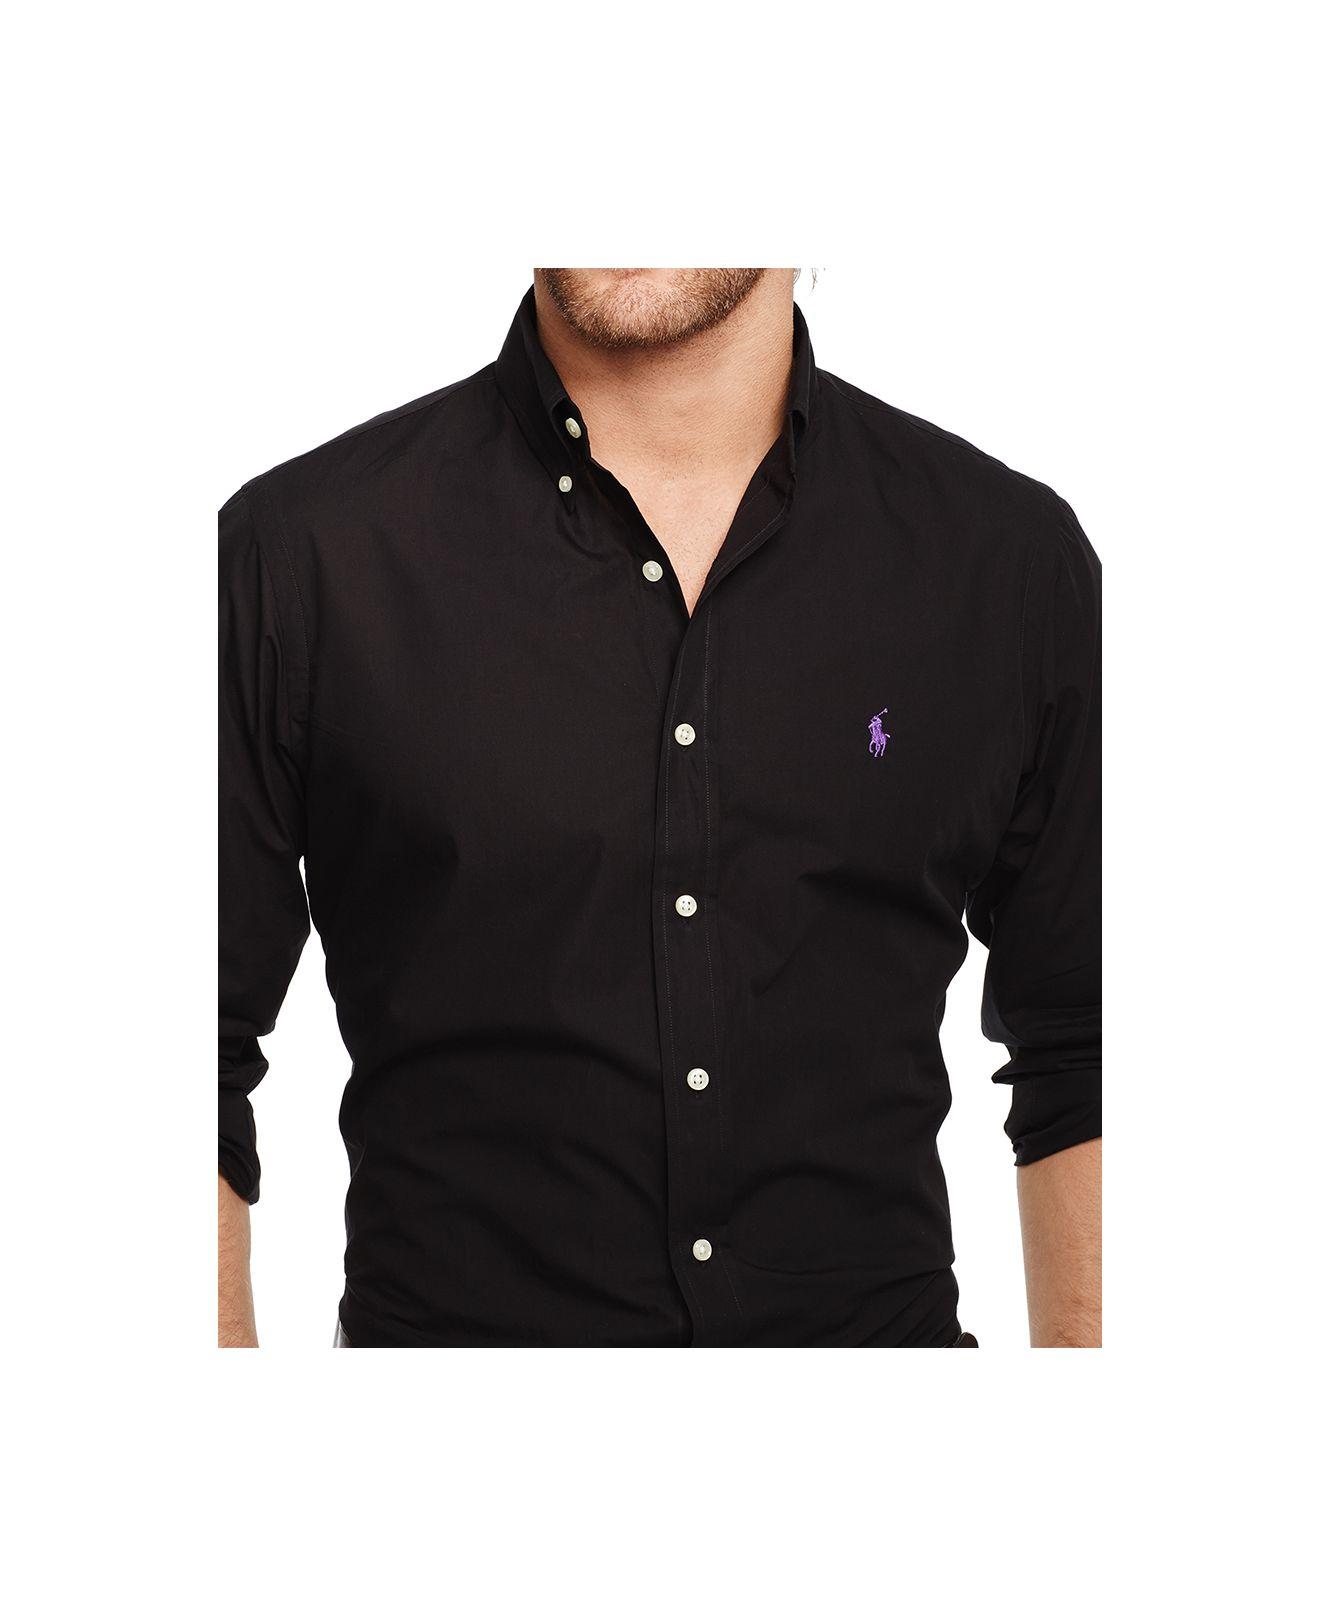 4e2492f1f9b ... discount lyst polo ralph lauren mens slim fit poplin shirt in black for  men d16de 67748